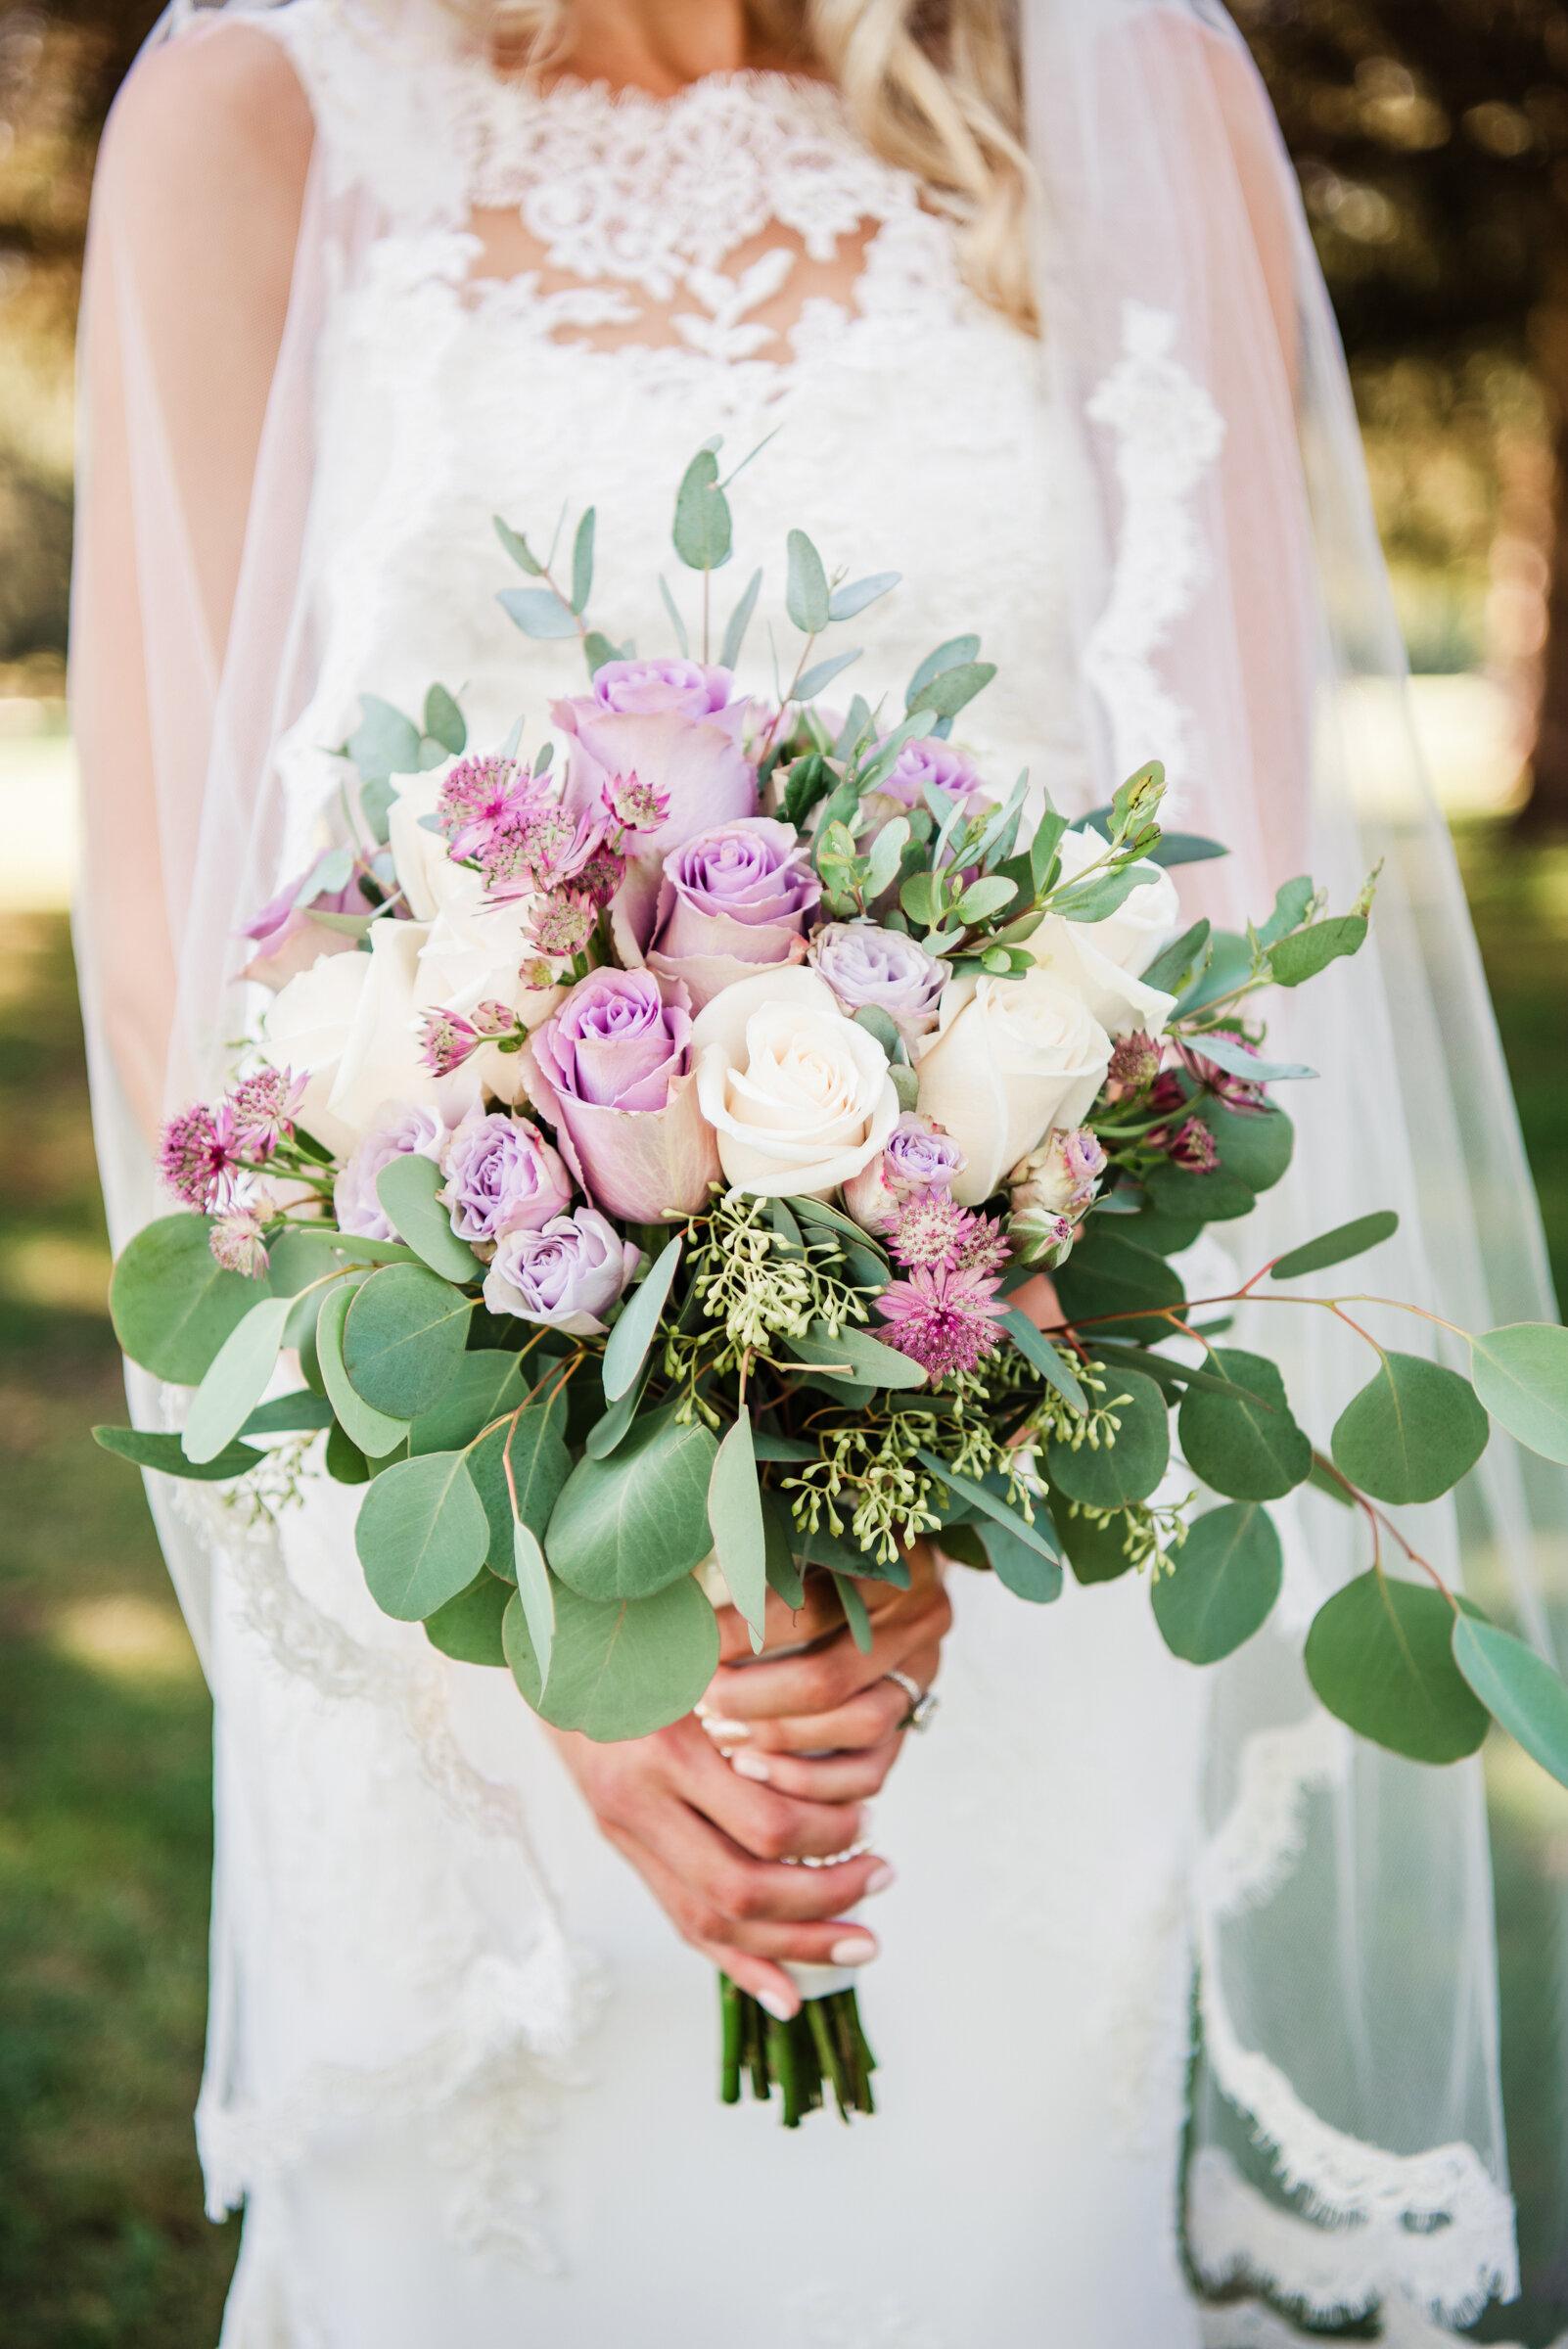 Deerfield_Country_Club_Rochester_Wedding_JILL_STUDIO_Rochester_NY_Photographer_DSC_6157.jpg